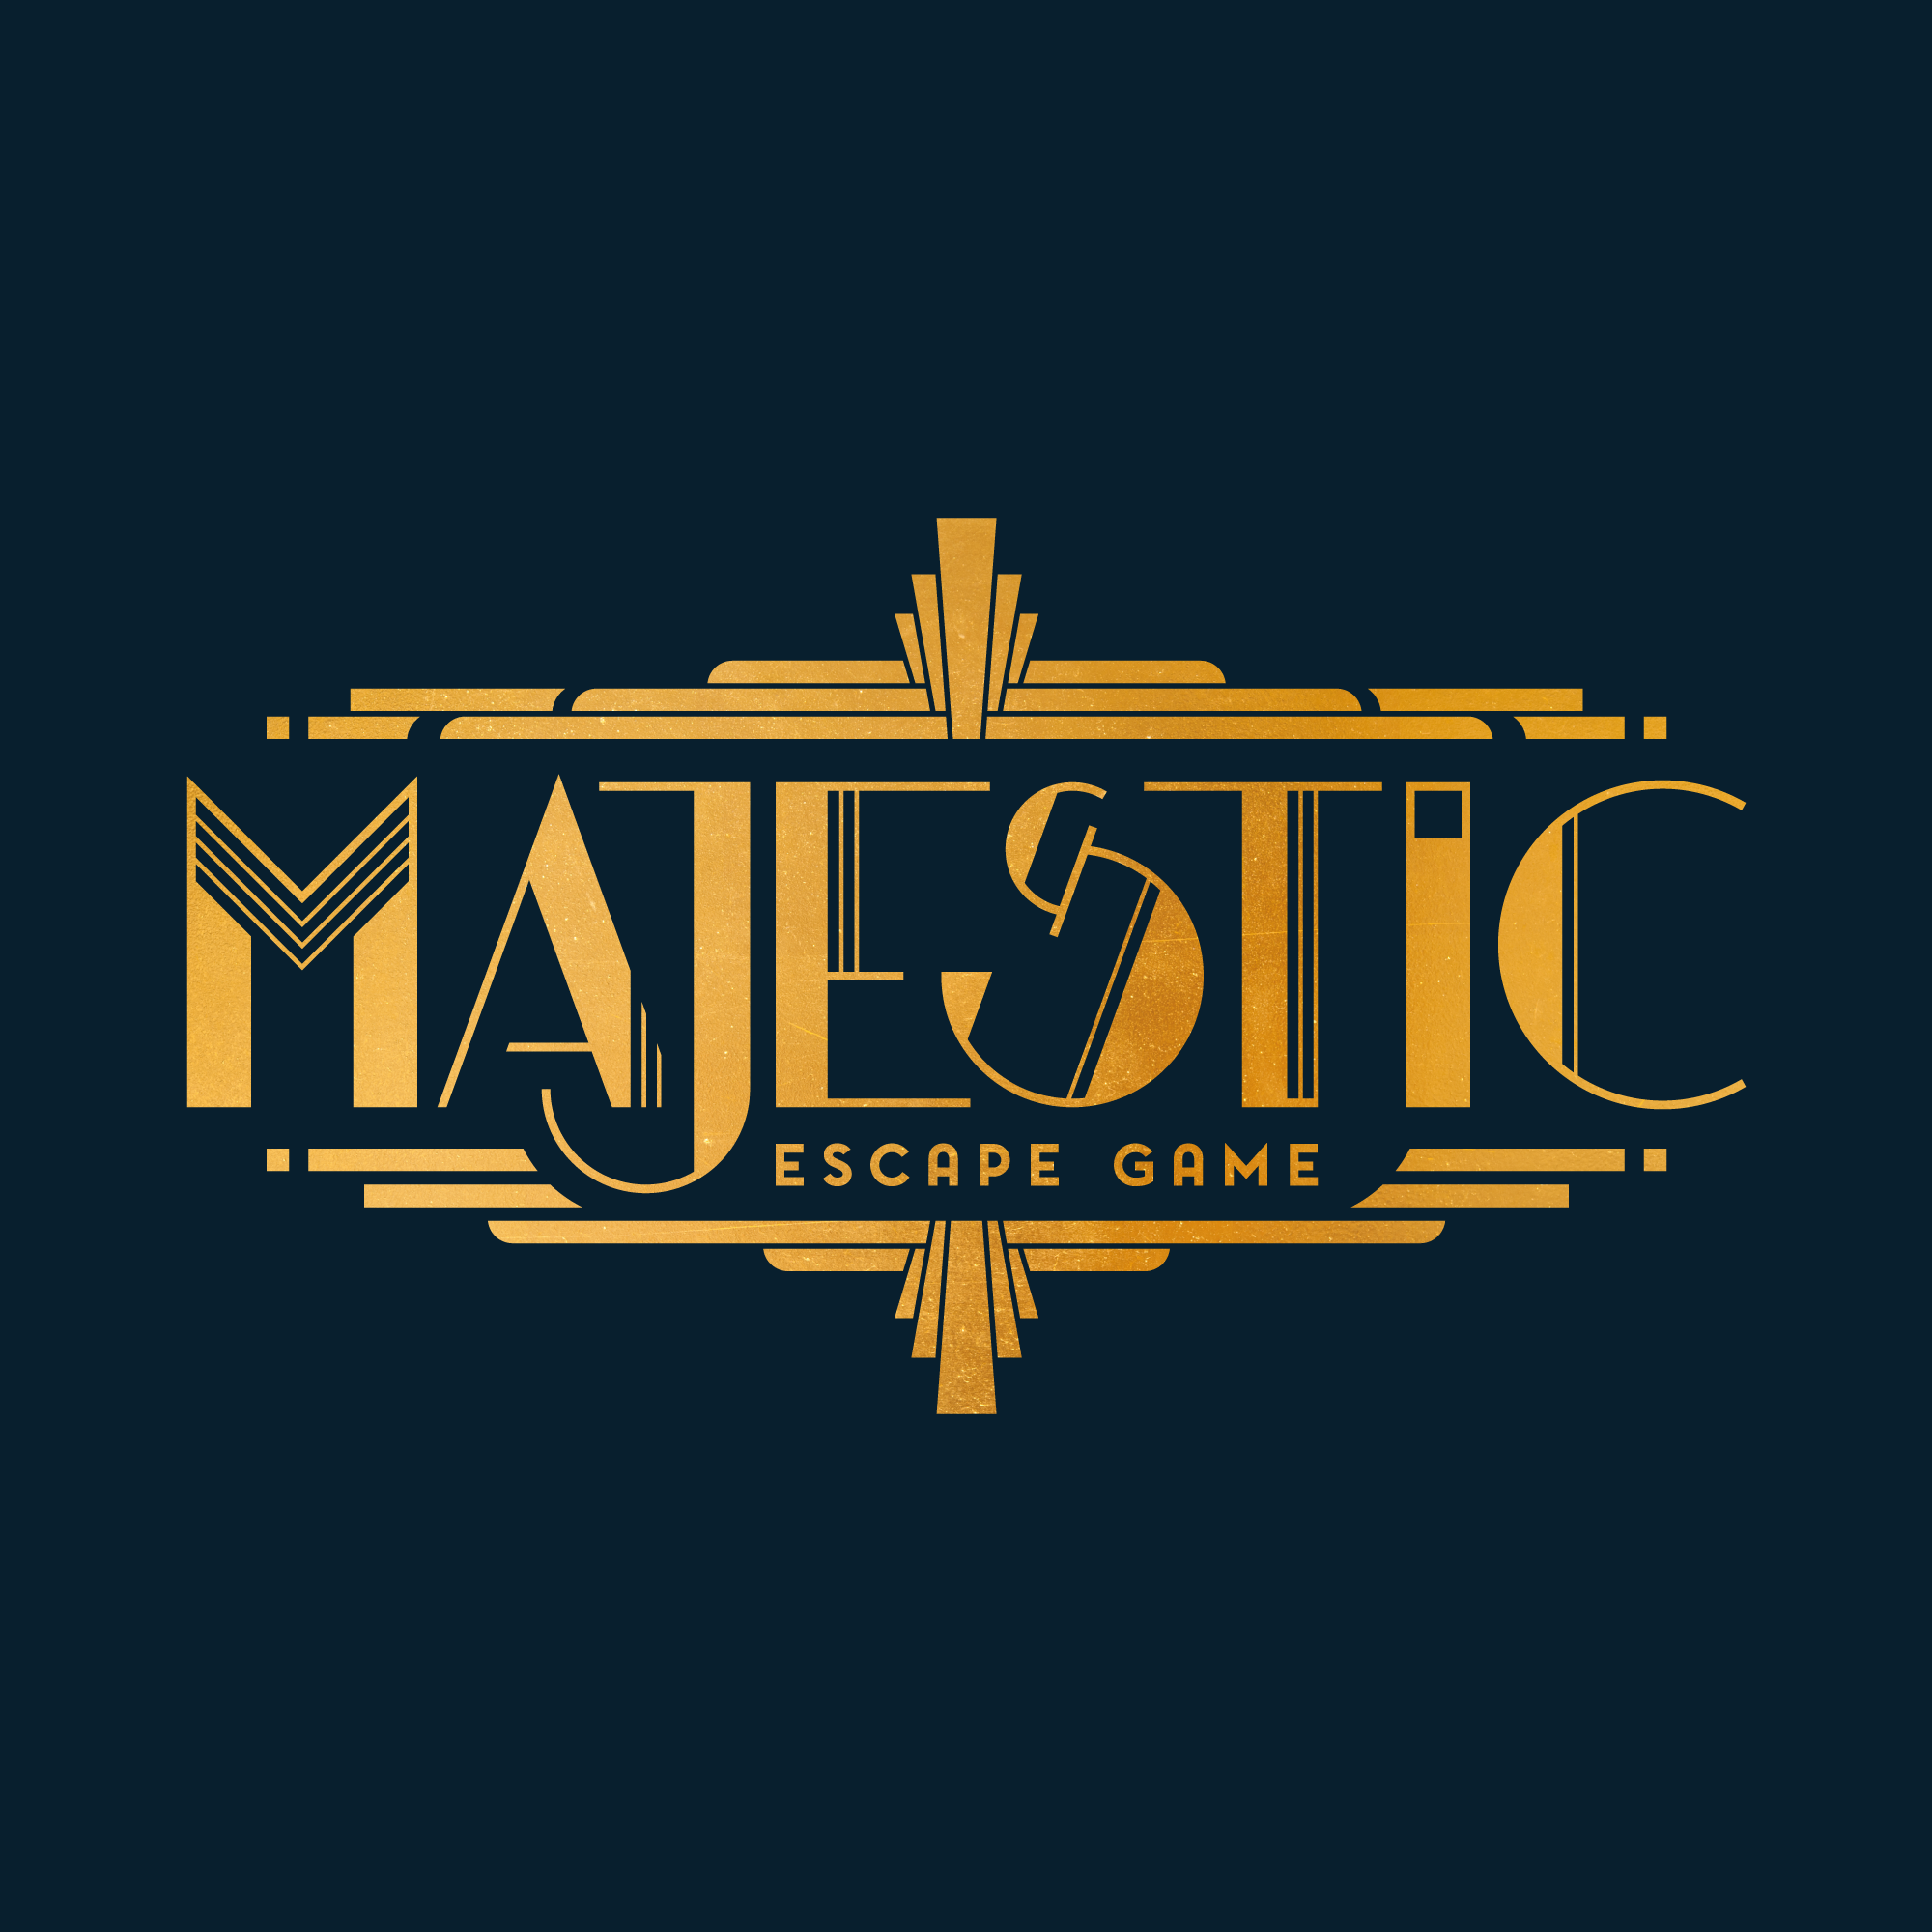 majestic escape game paris escape game avis promo. Black Bedroom Furniture Sets. Home Design Ideas